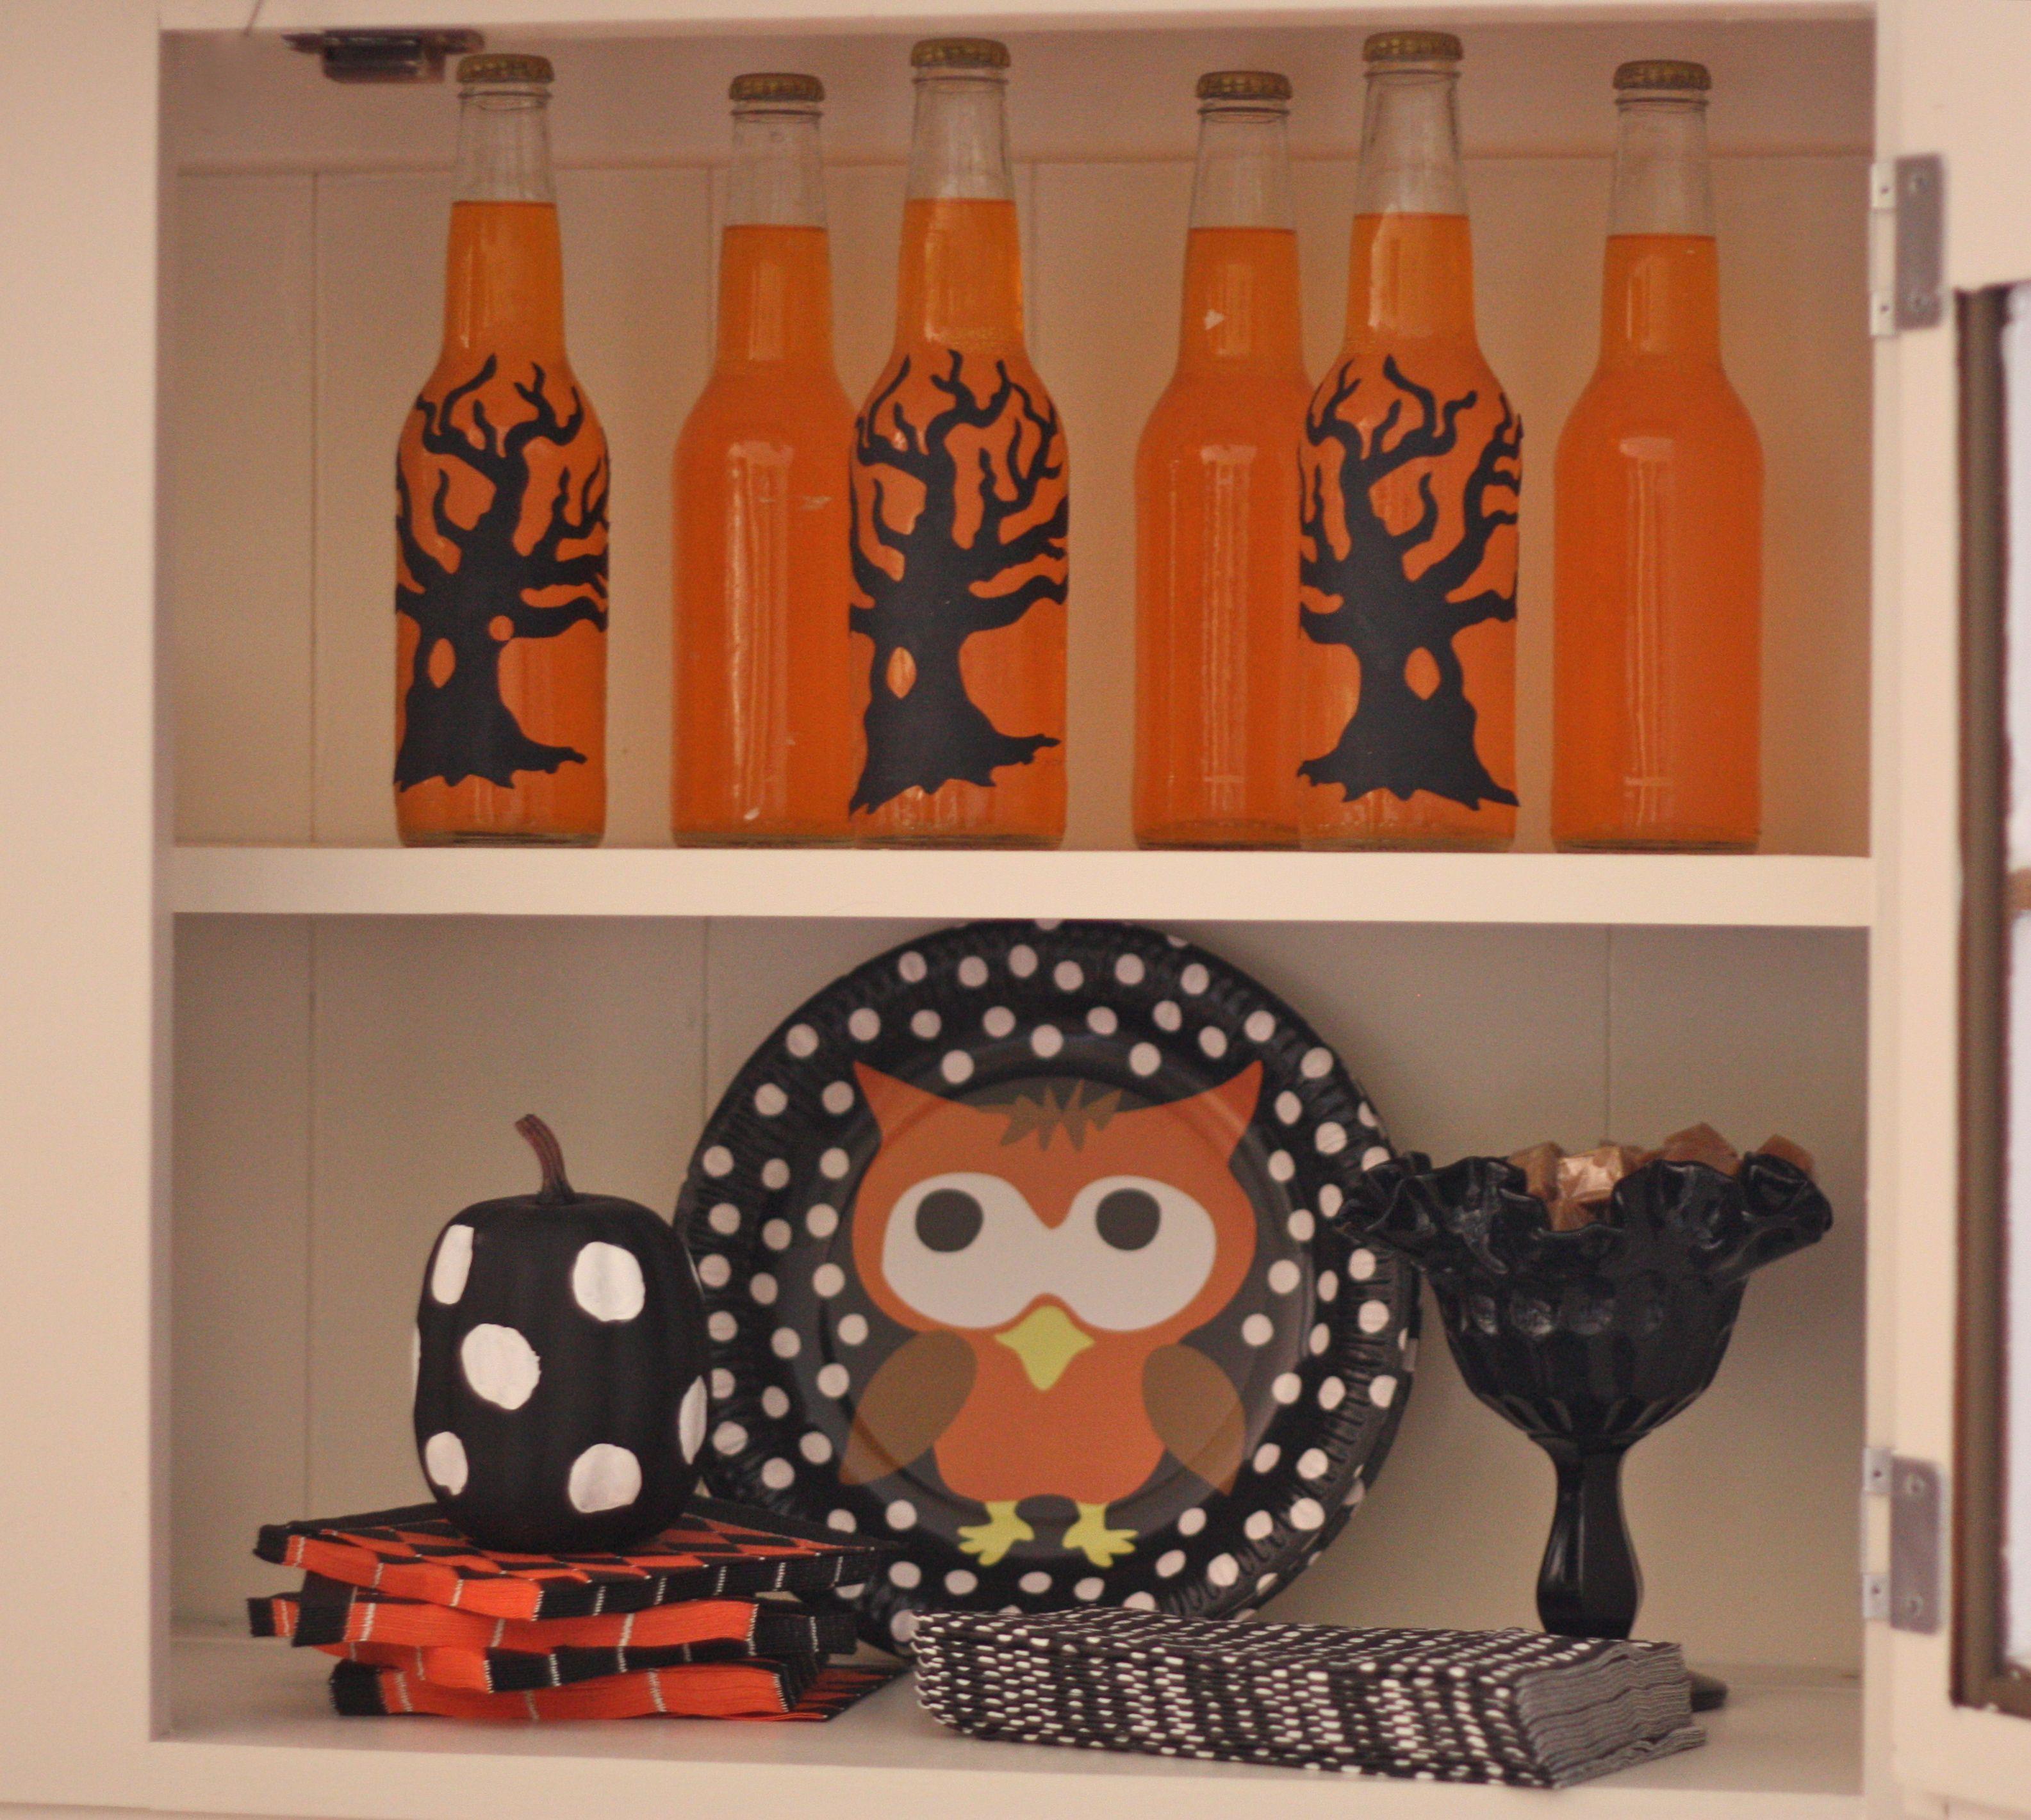 Liquor Cabinet Halloween Costumes  My Halloween Hutch Goodwill owls trees spooky Fall